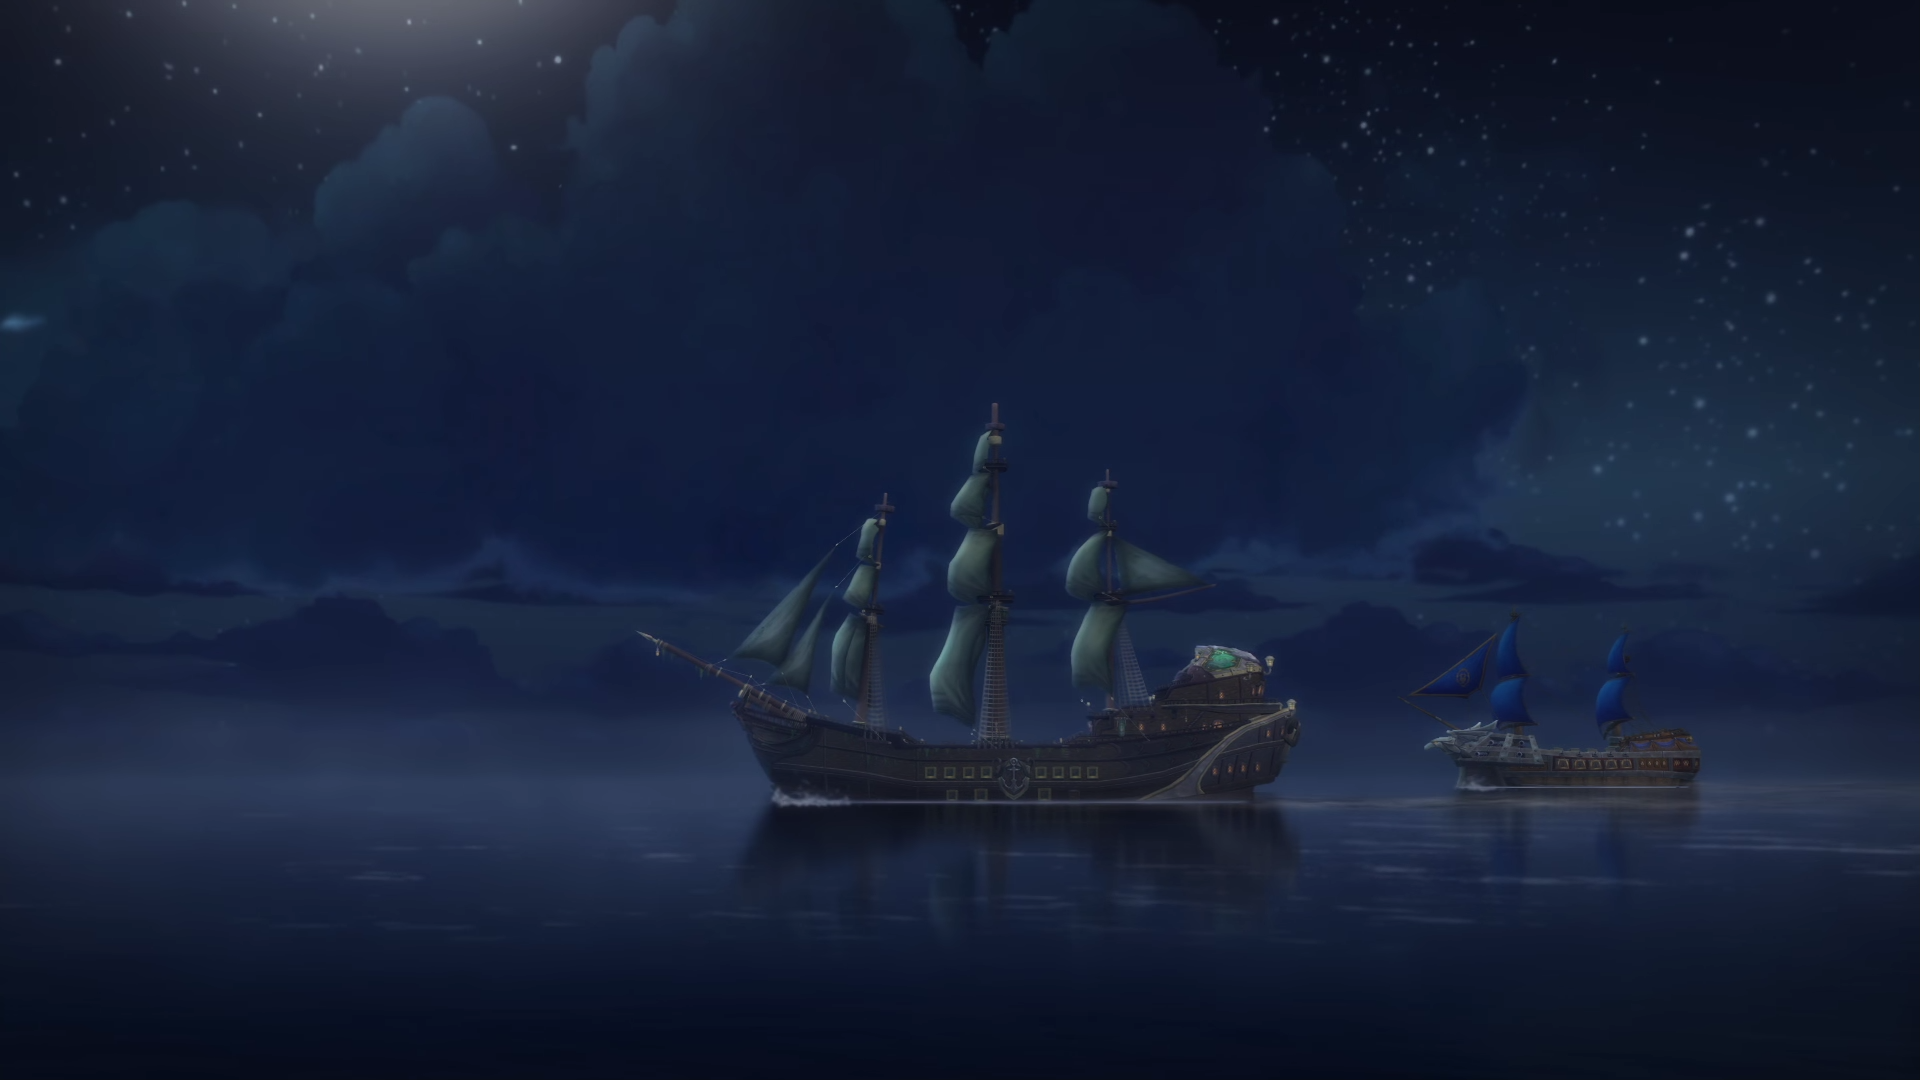 World Of Warcraft Screenshot 2018.08.18 - 16.25.42.40.png - World of Warcraft